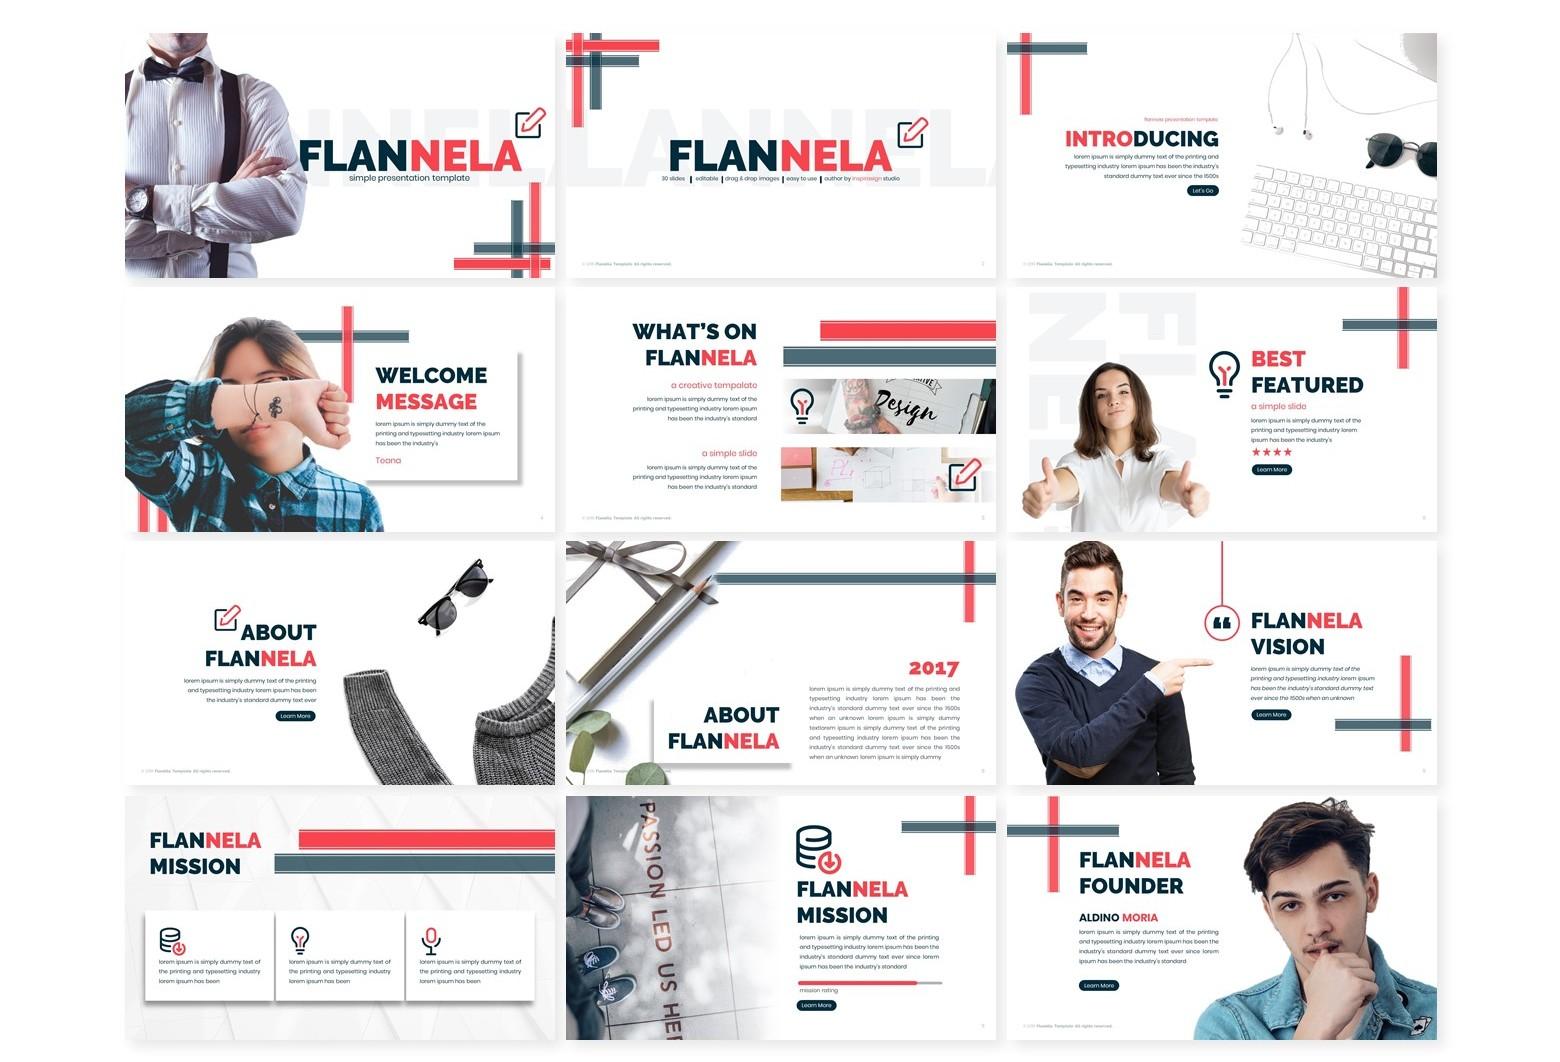 Flannela Keynote Template - Slide1 46 -